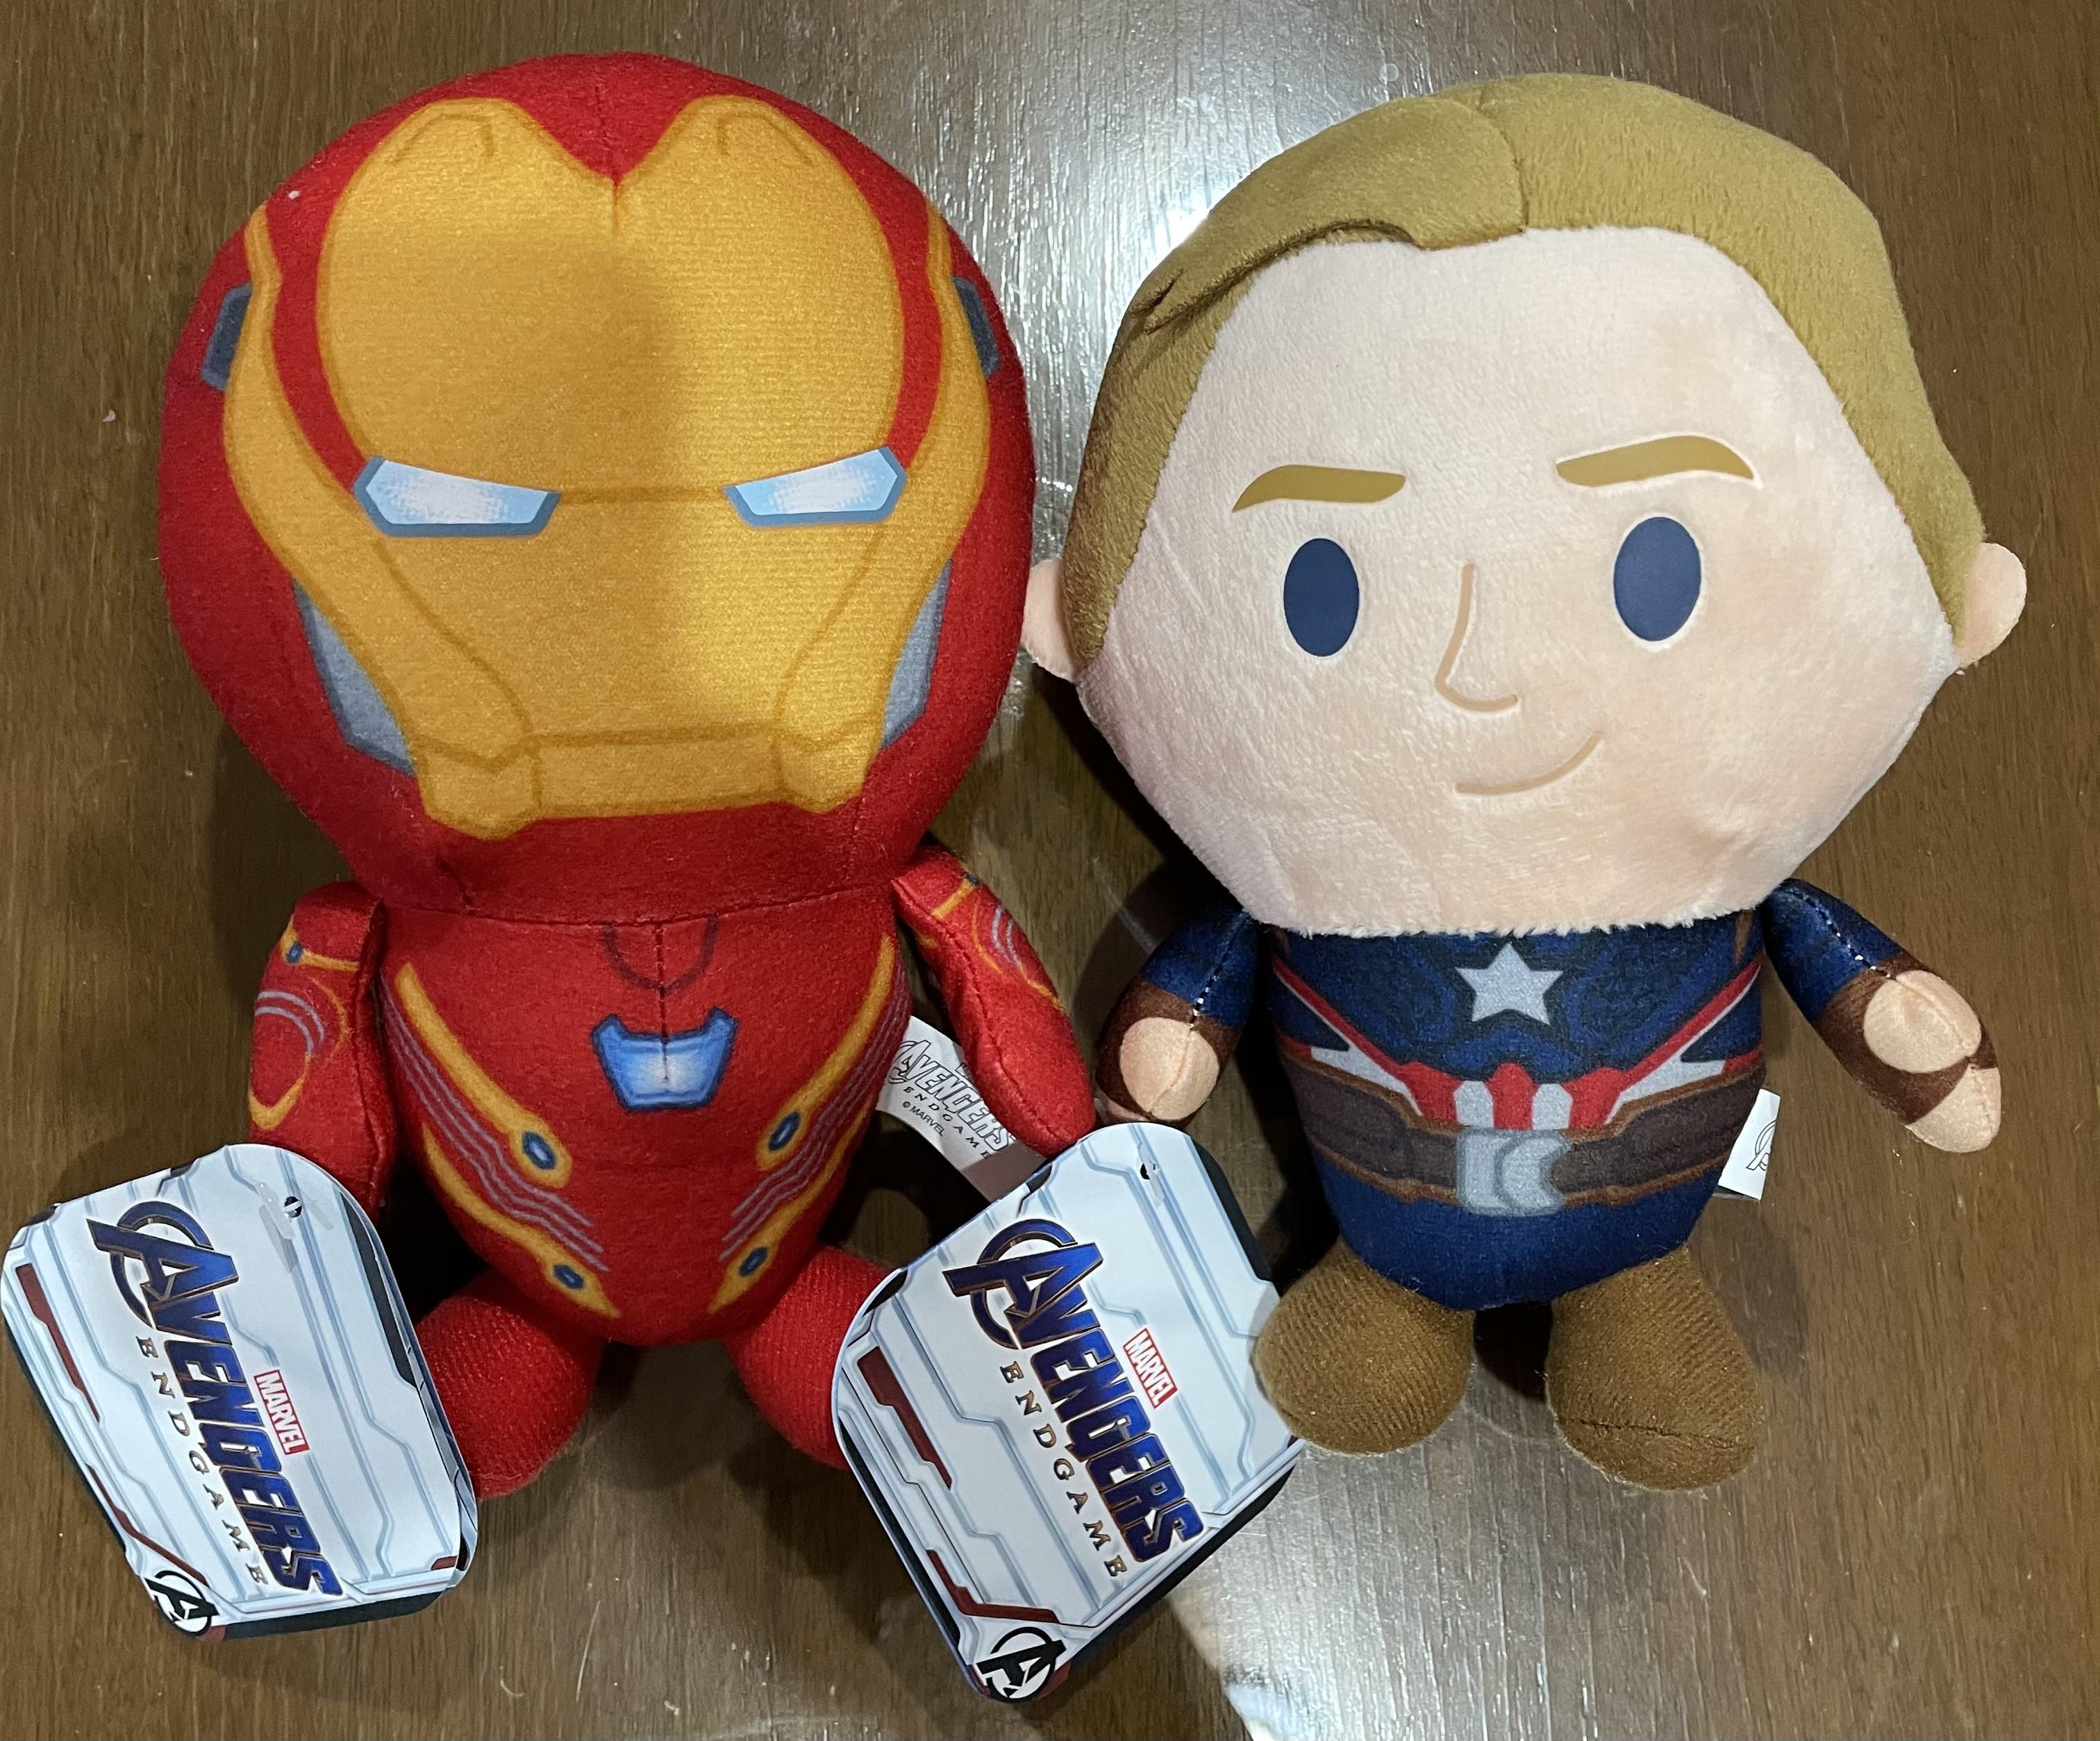 Bodega Aurrera: Iron man y capitán América del peluche